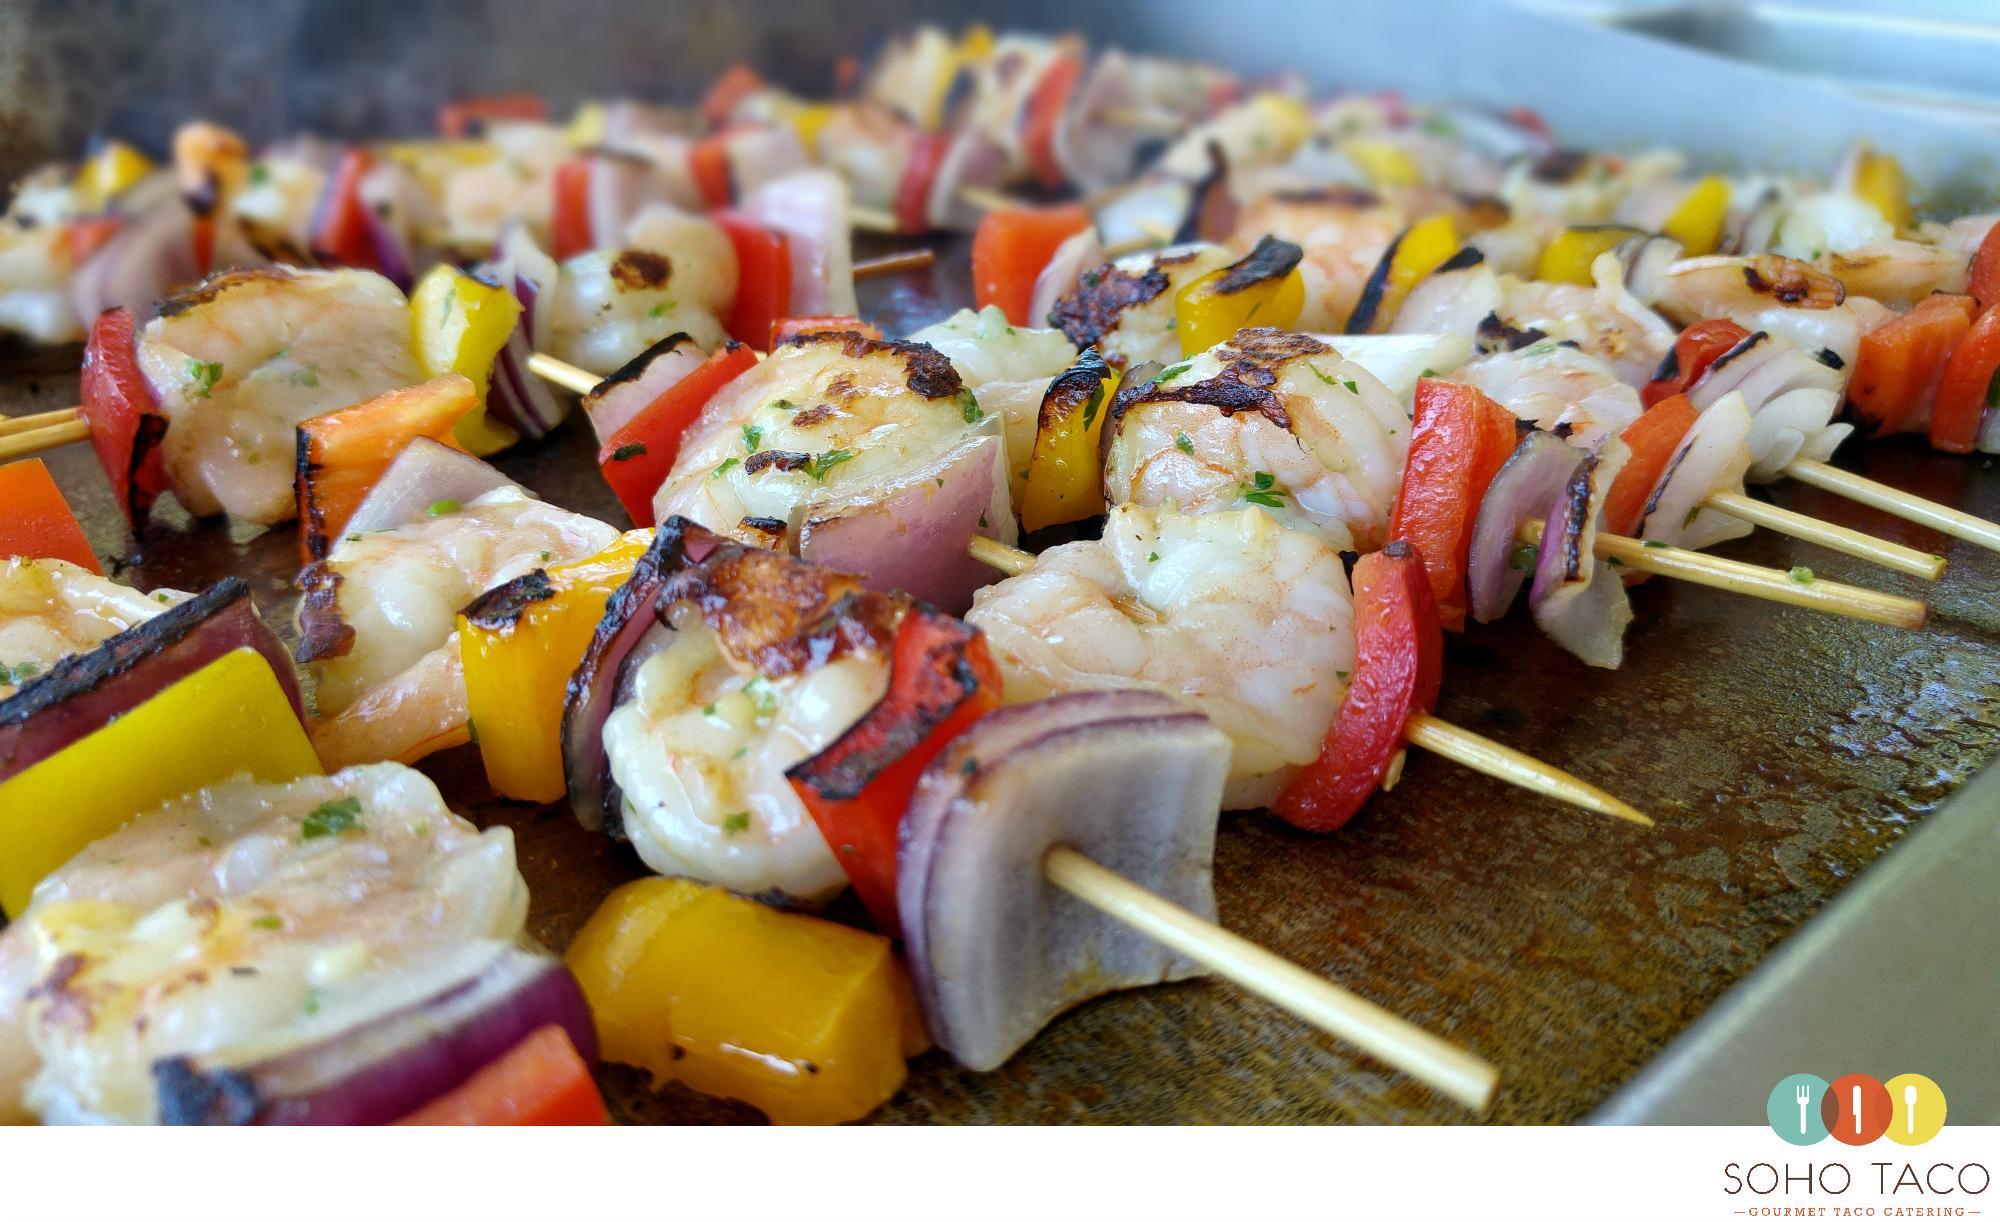 SOHO TACO Gourmet Taco Catering - Rancho Buena Vista Adobe - Wedding - Shrimp Skewers Appetizers